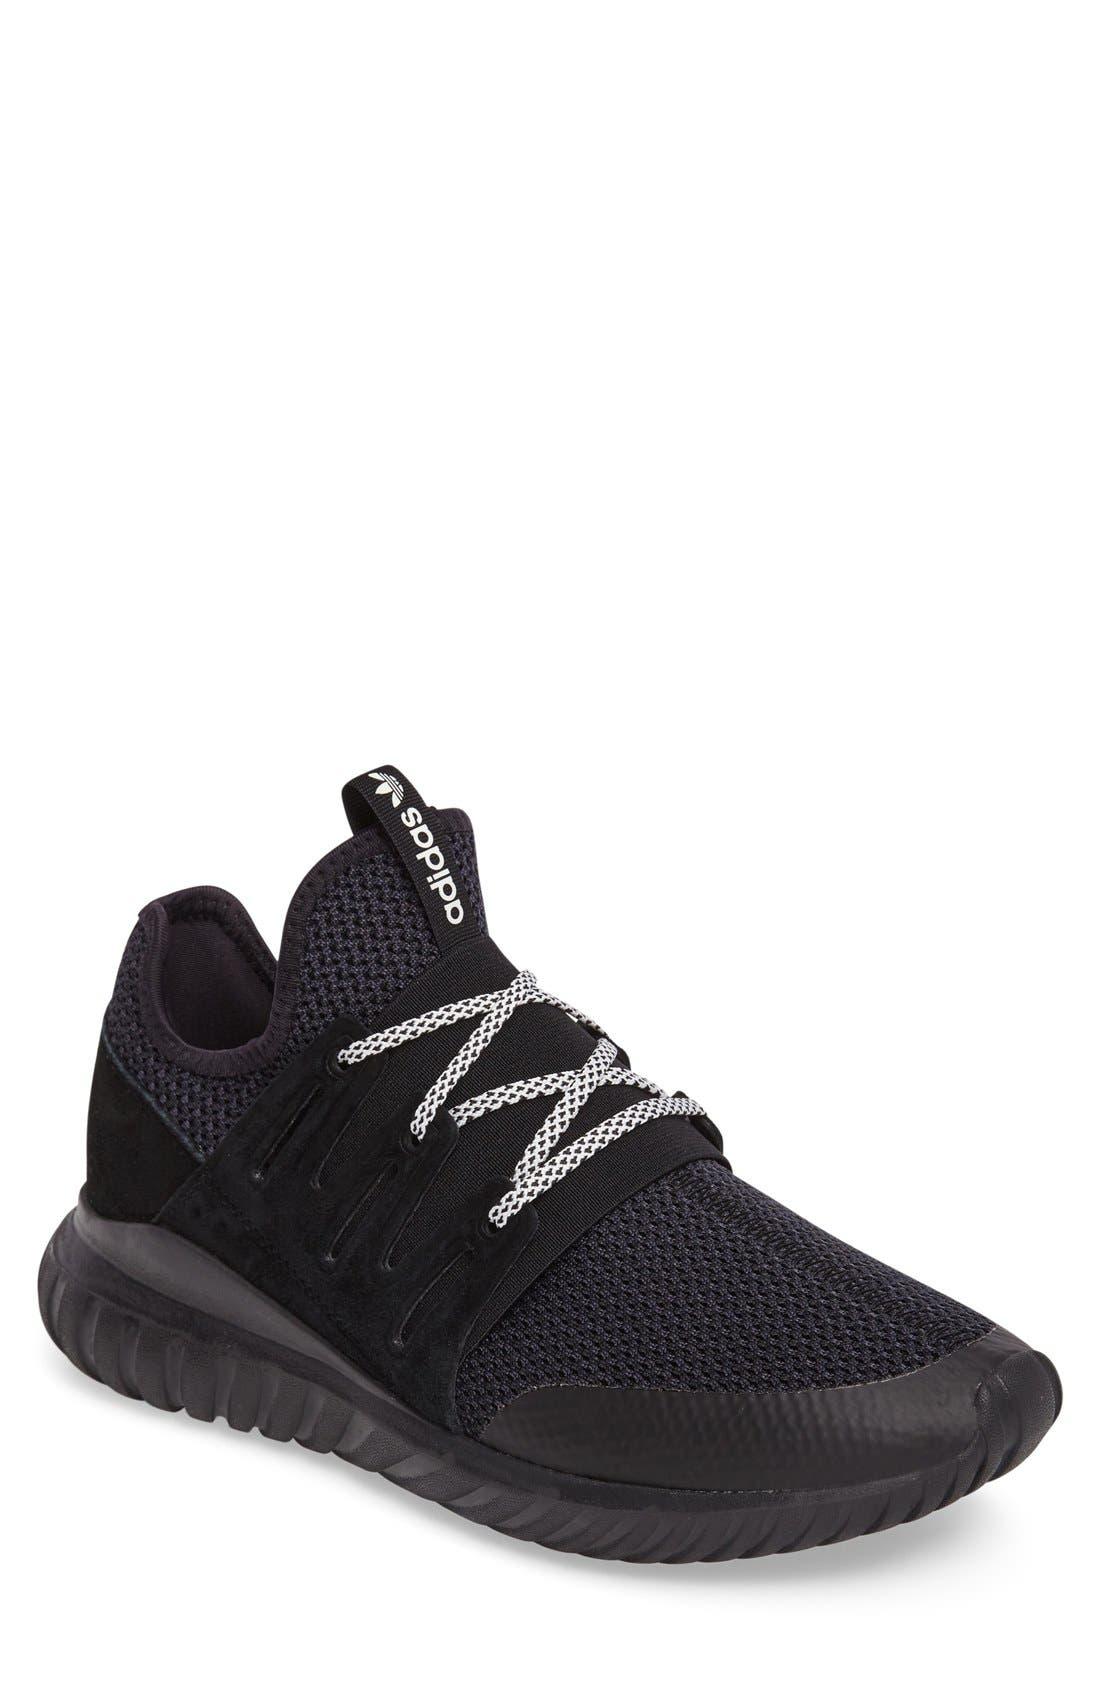 Alternate Image 1 Selected - adidas 'Tubular Radial' Sneaker (Men)